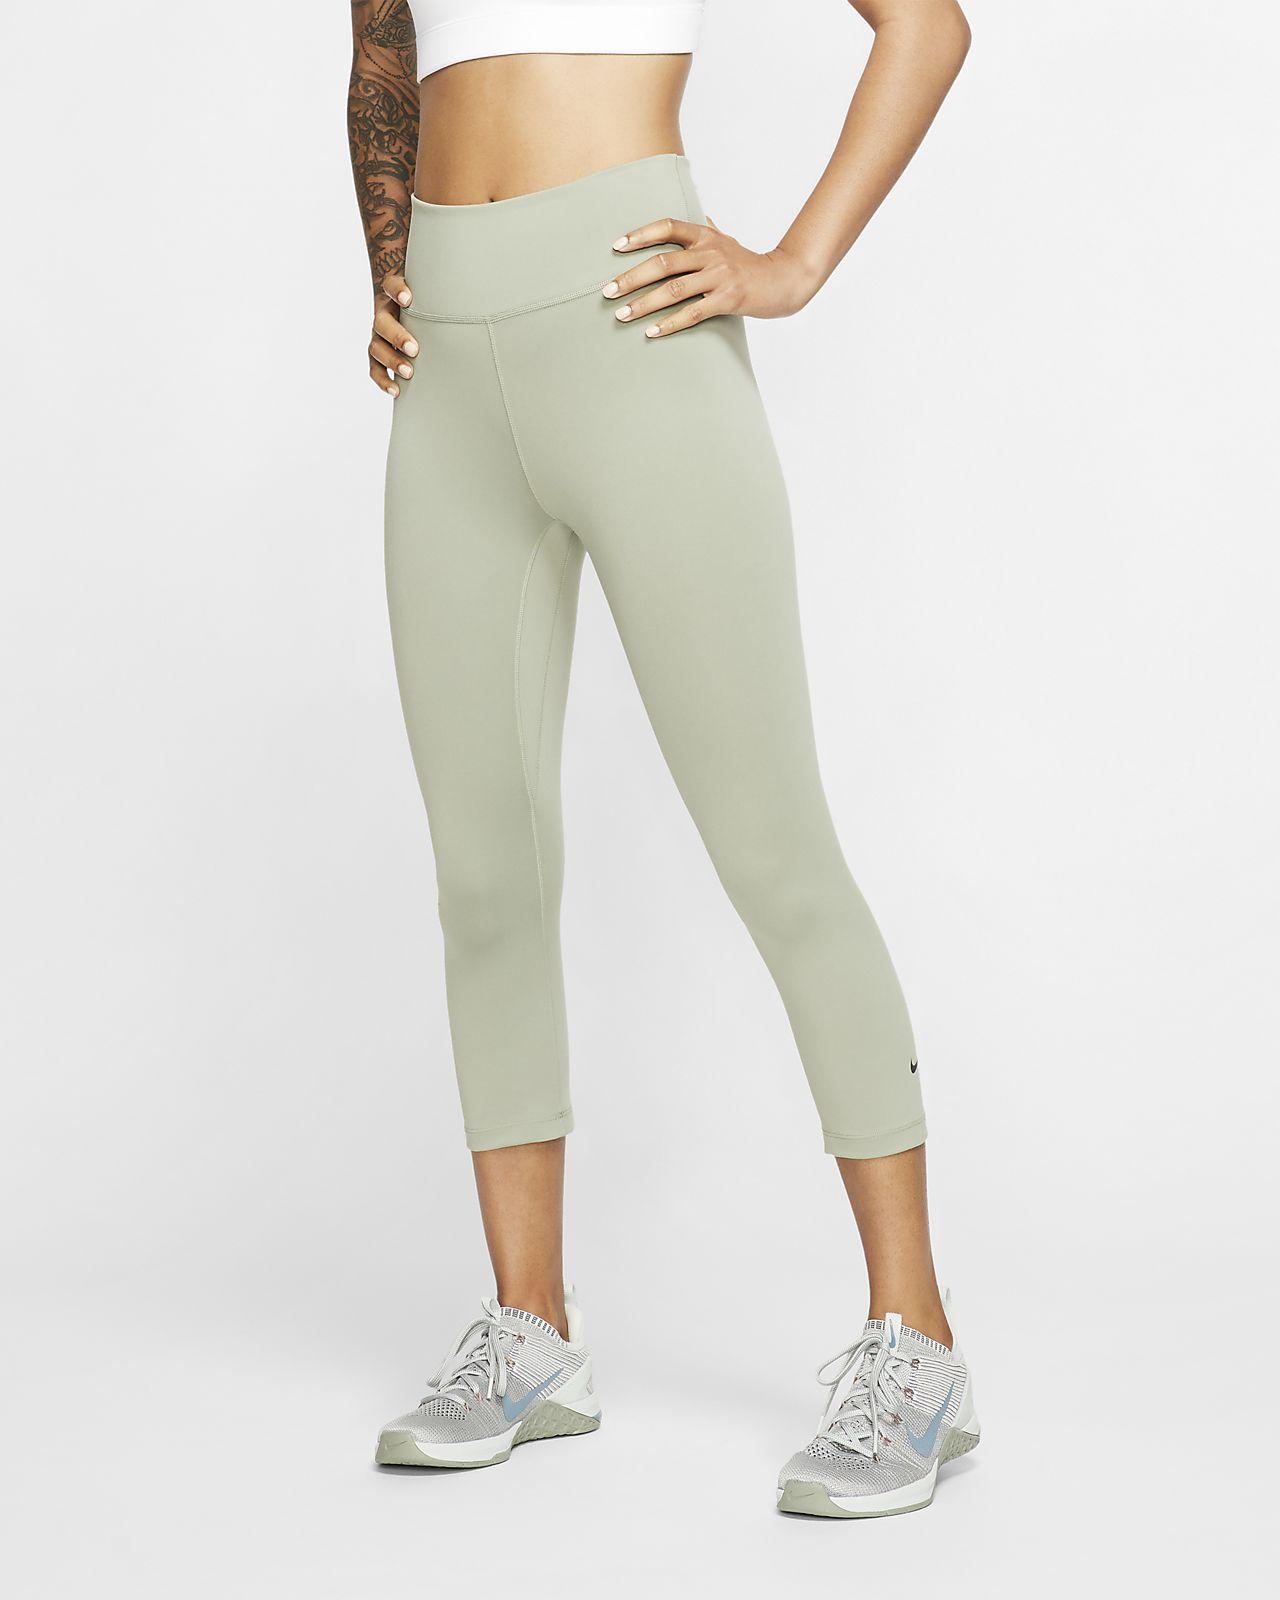 Nike One Women's Capris